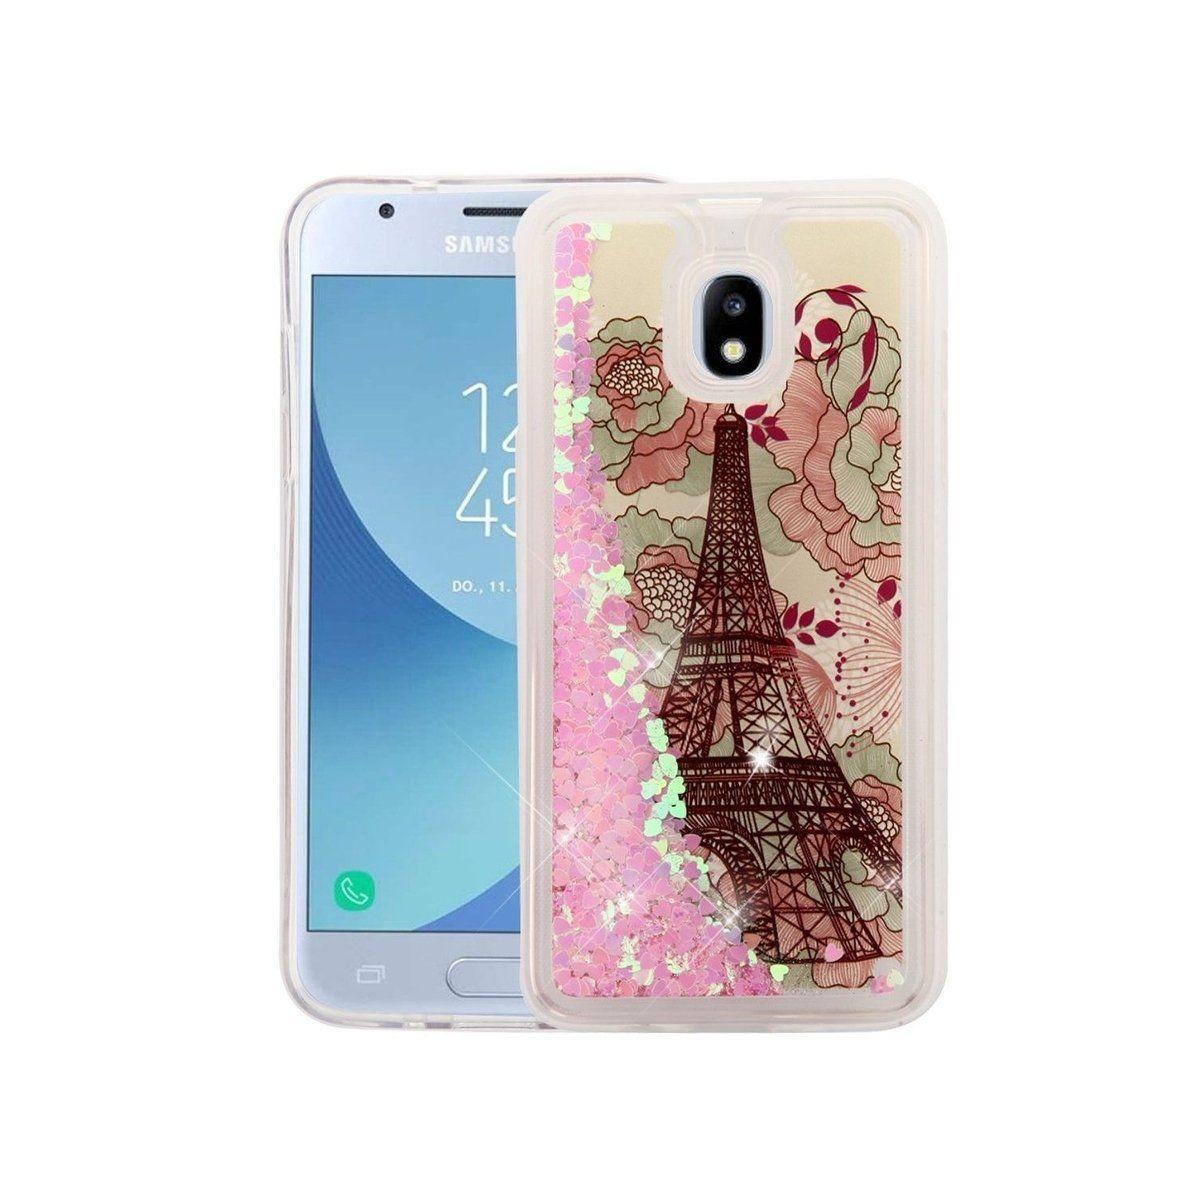 Insten For Samsung Galaxy Express Prime 3 J3 2016 J3 2018 Eiffel Tower Hard Case Cool Bluetooth Speakers Galaxy Express Best Smartphone